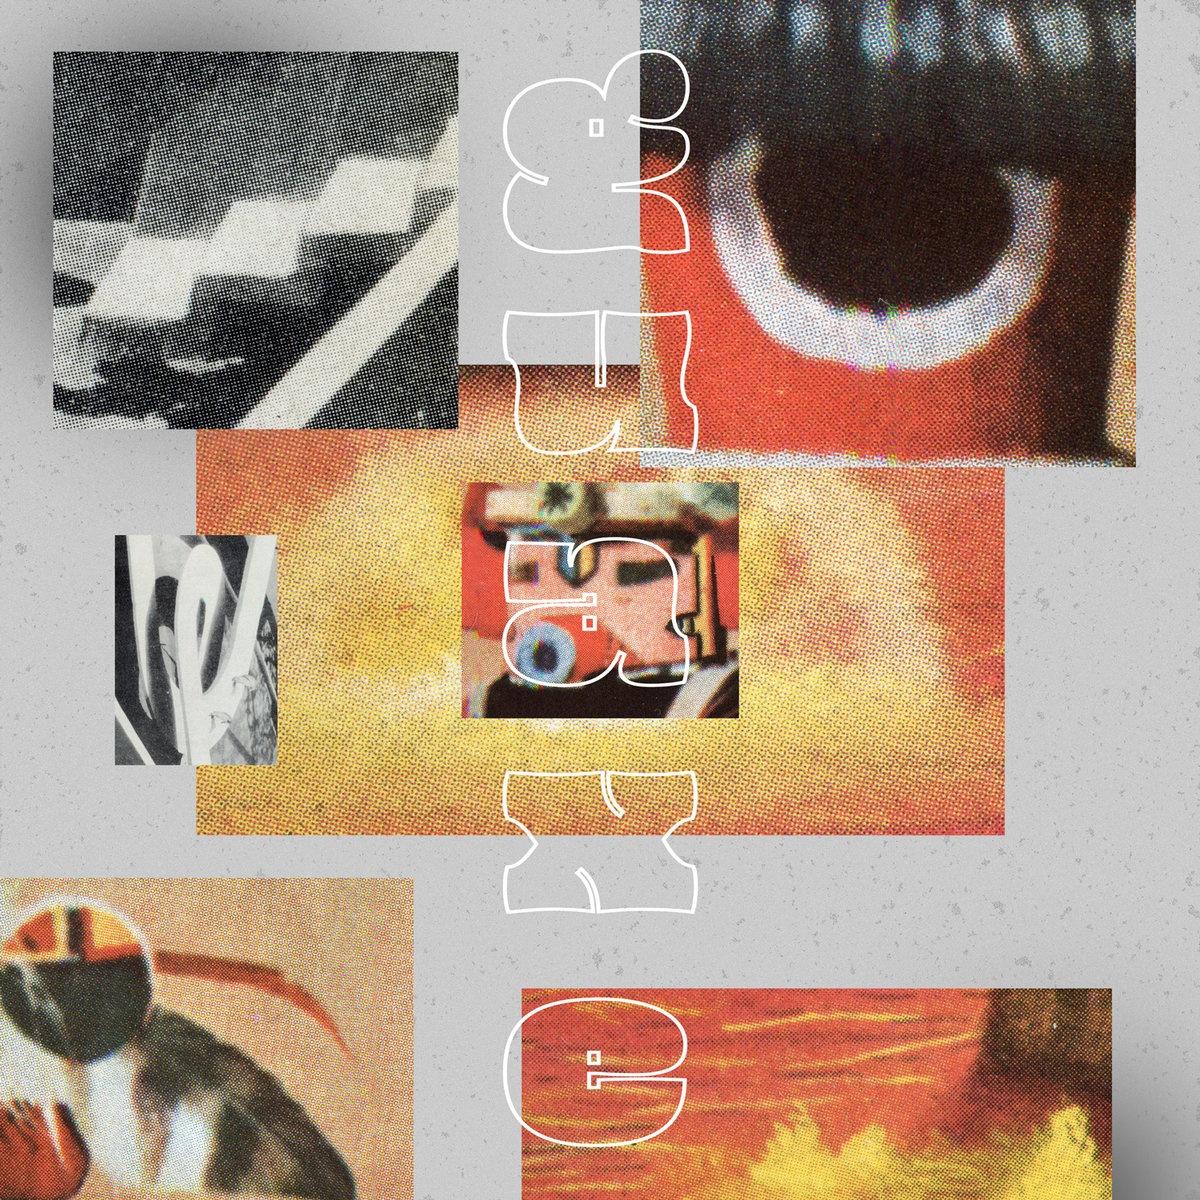 Guaxe – Guaxe (2019)